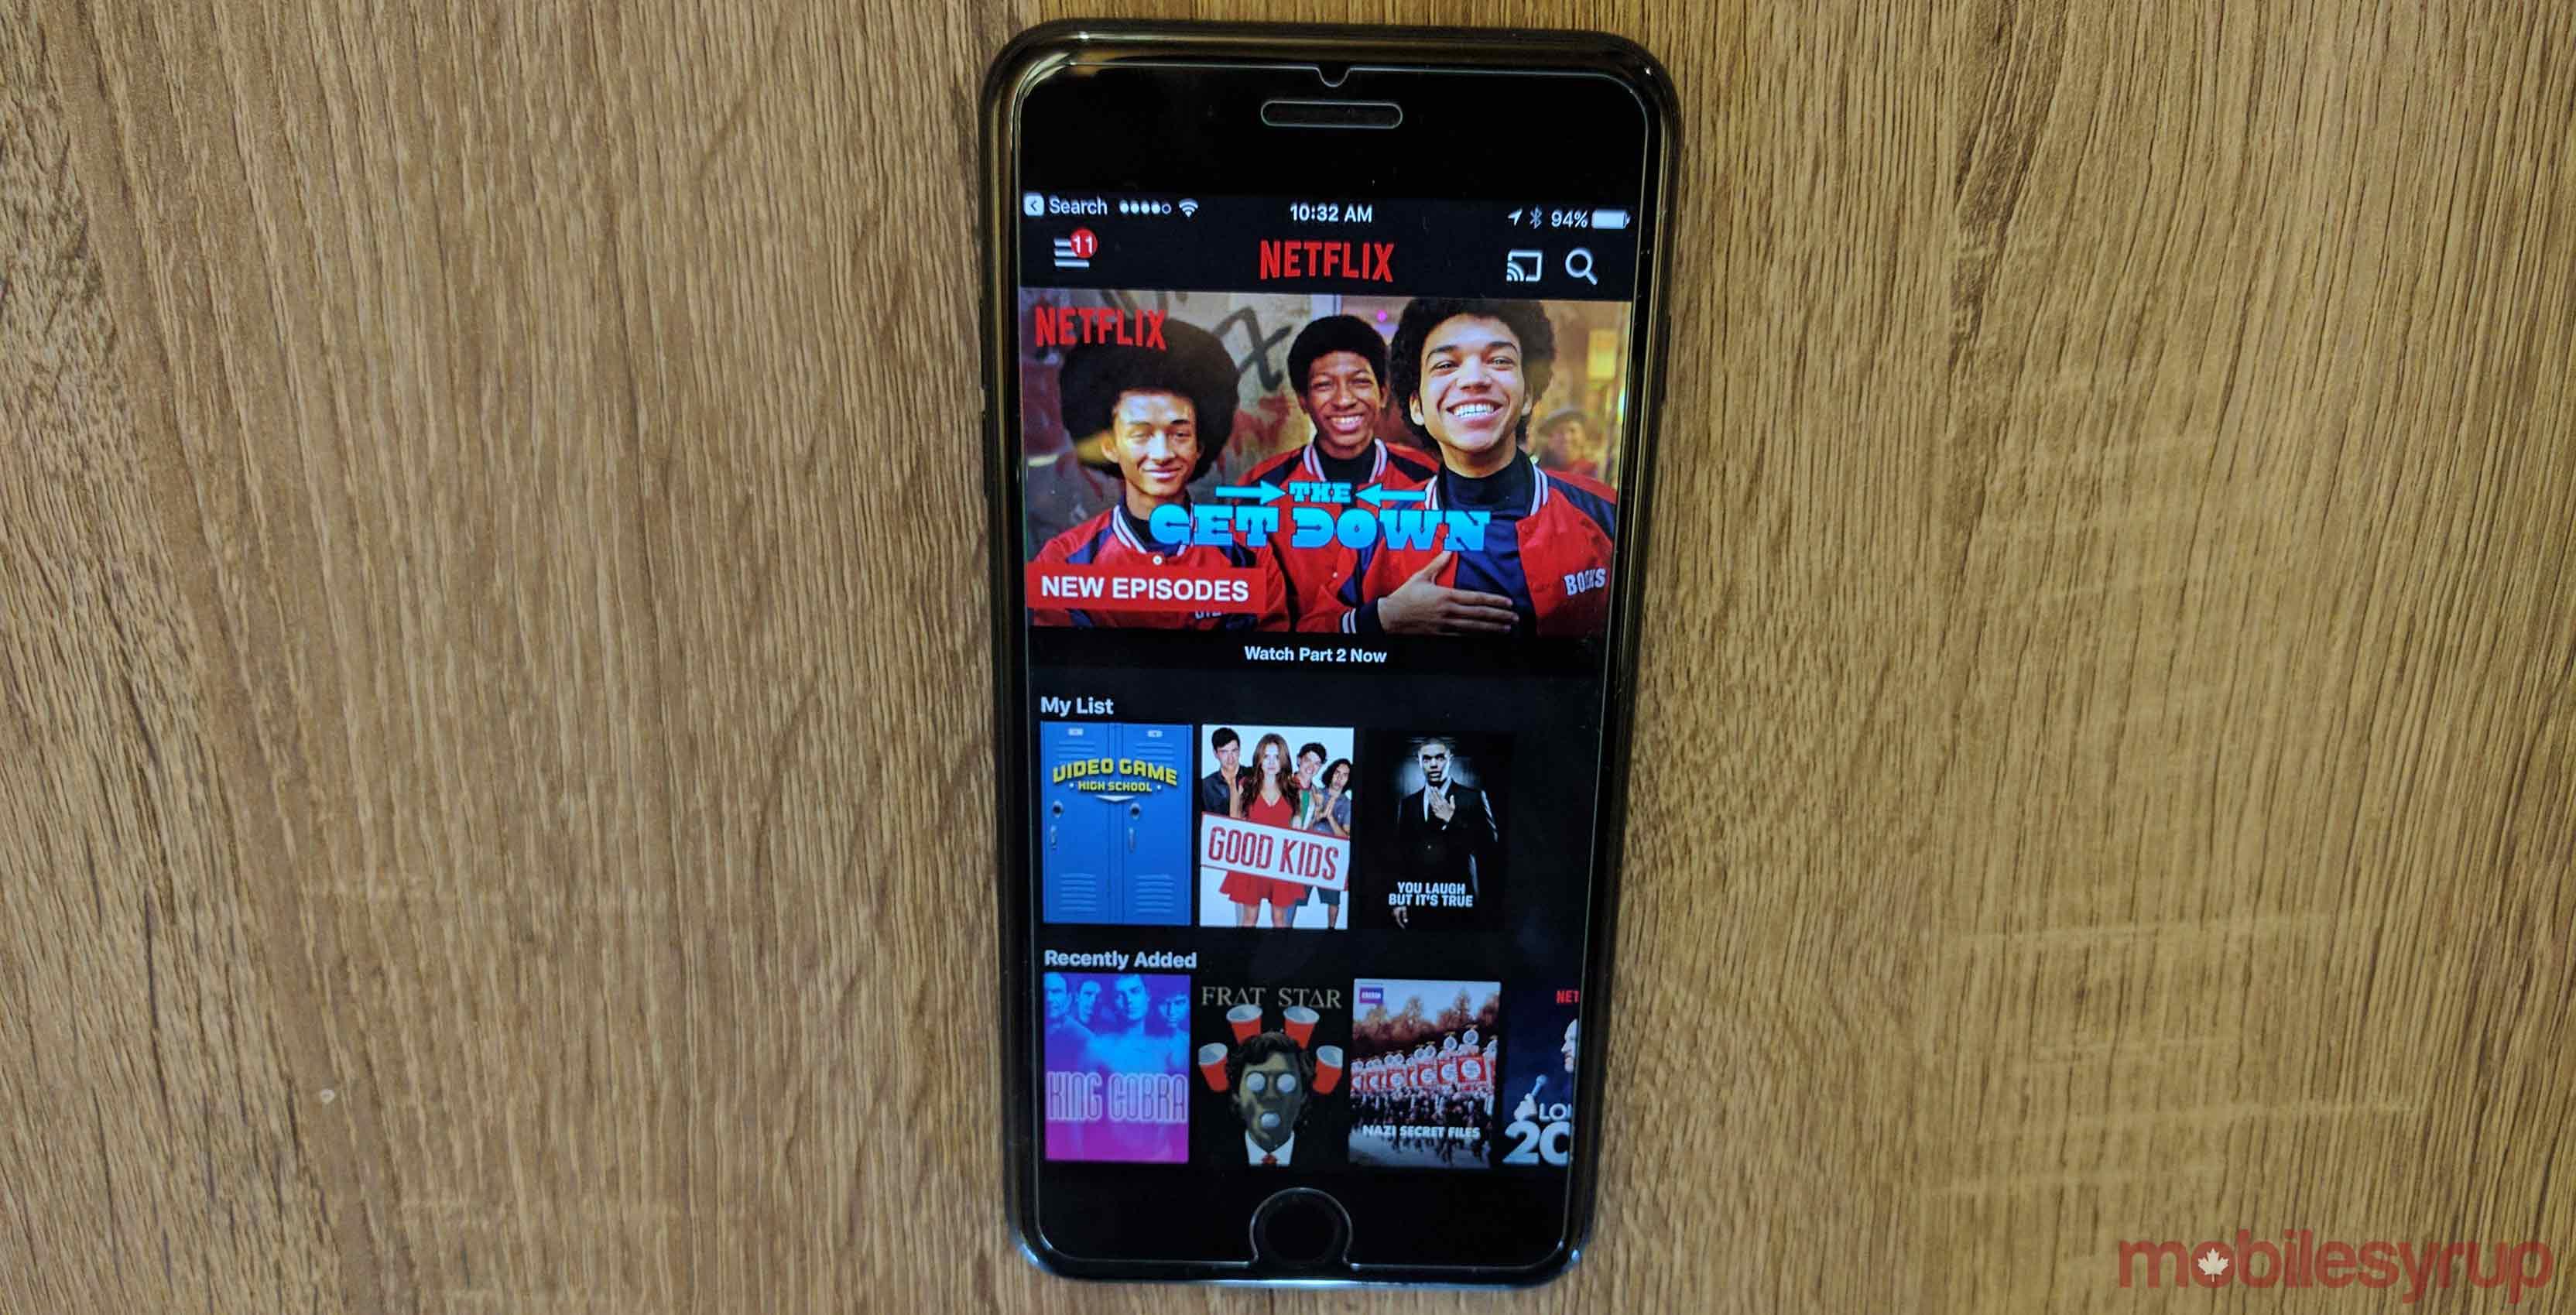 Netflix app opened on an iPhone 7